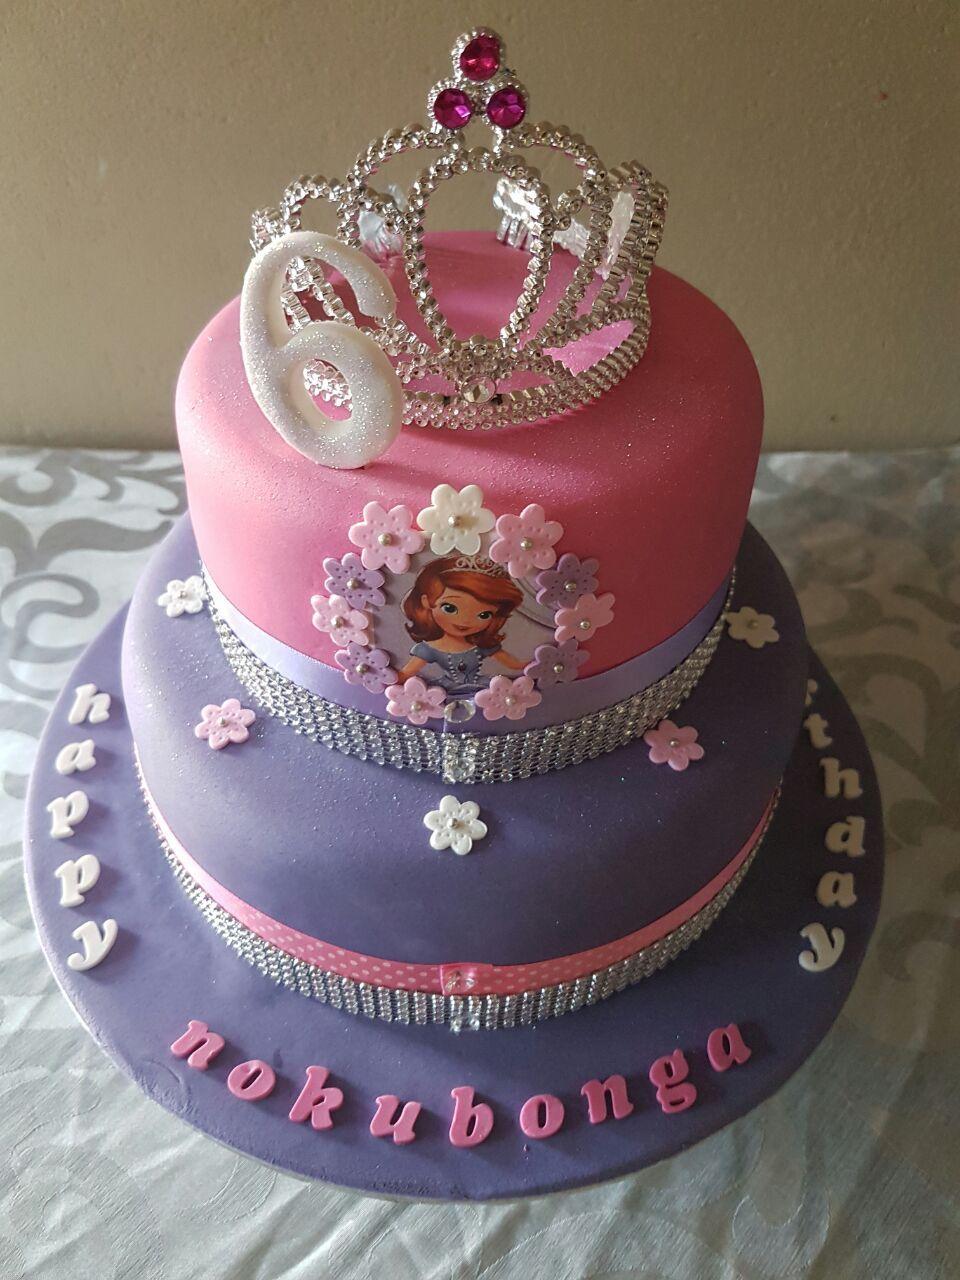 Marvelous 21 Wonderful Picture Of Princess Sofia Birthday Cake Birijus Com Funny Birthday Cards Online Inifodamsfinfo